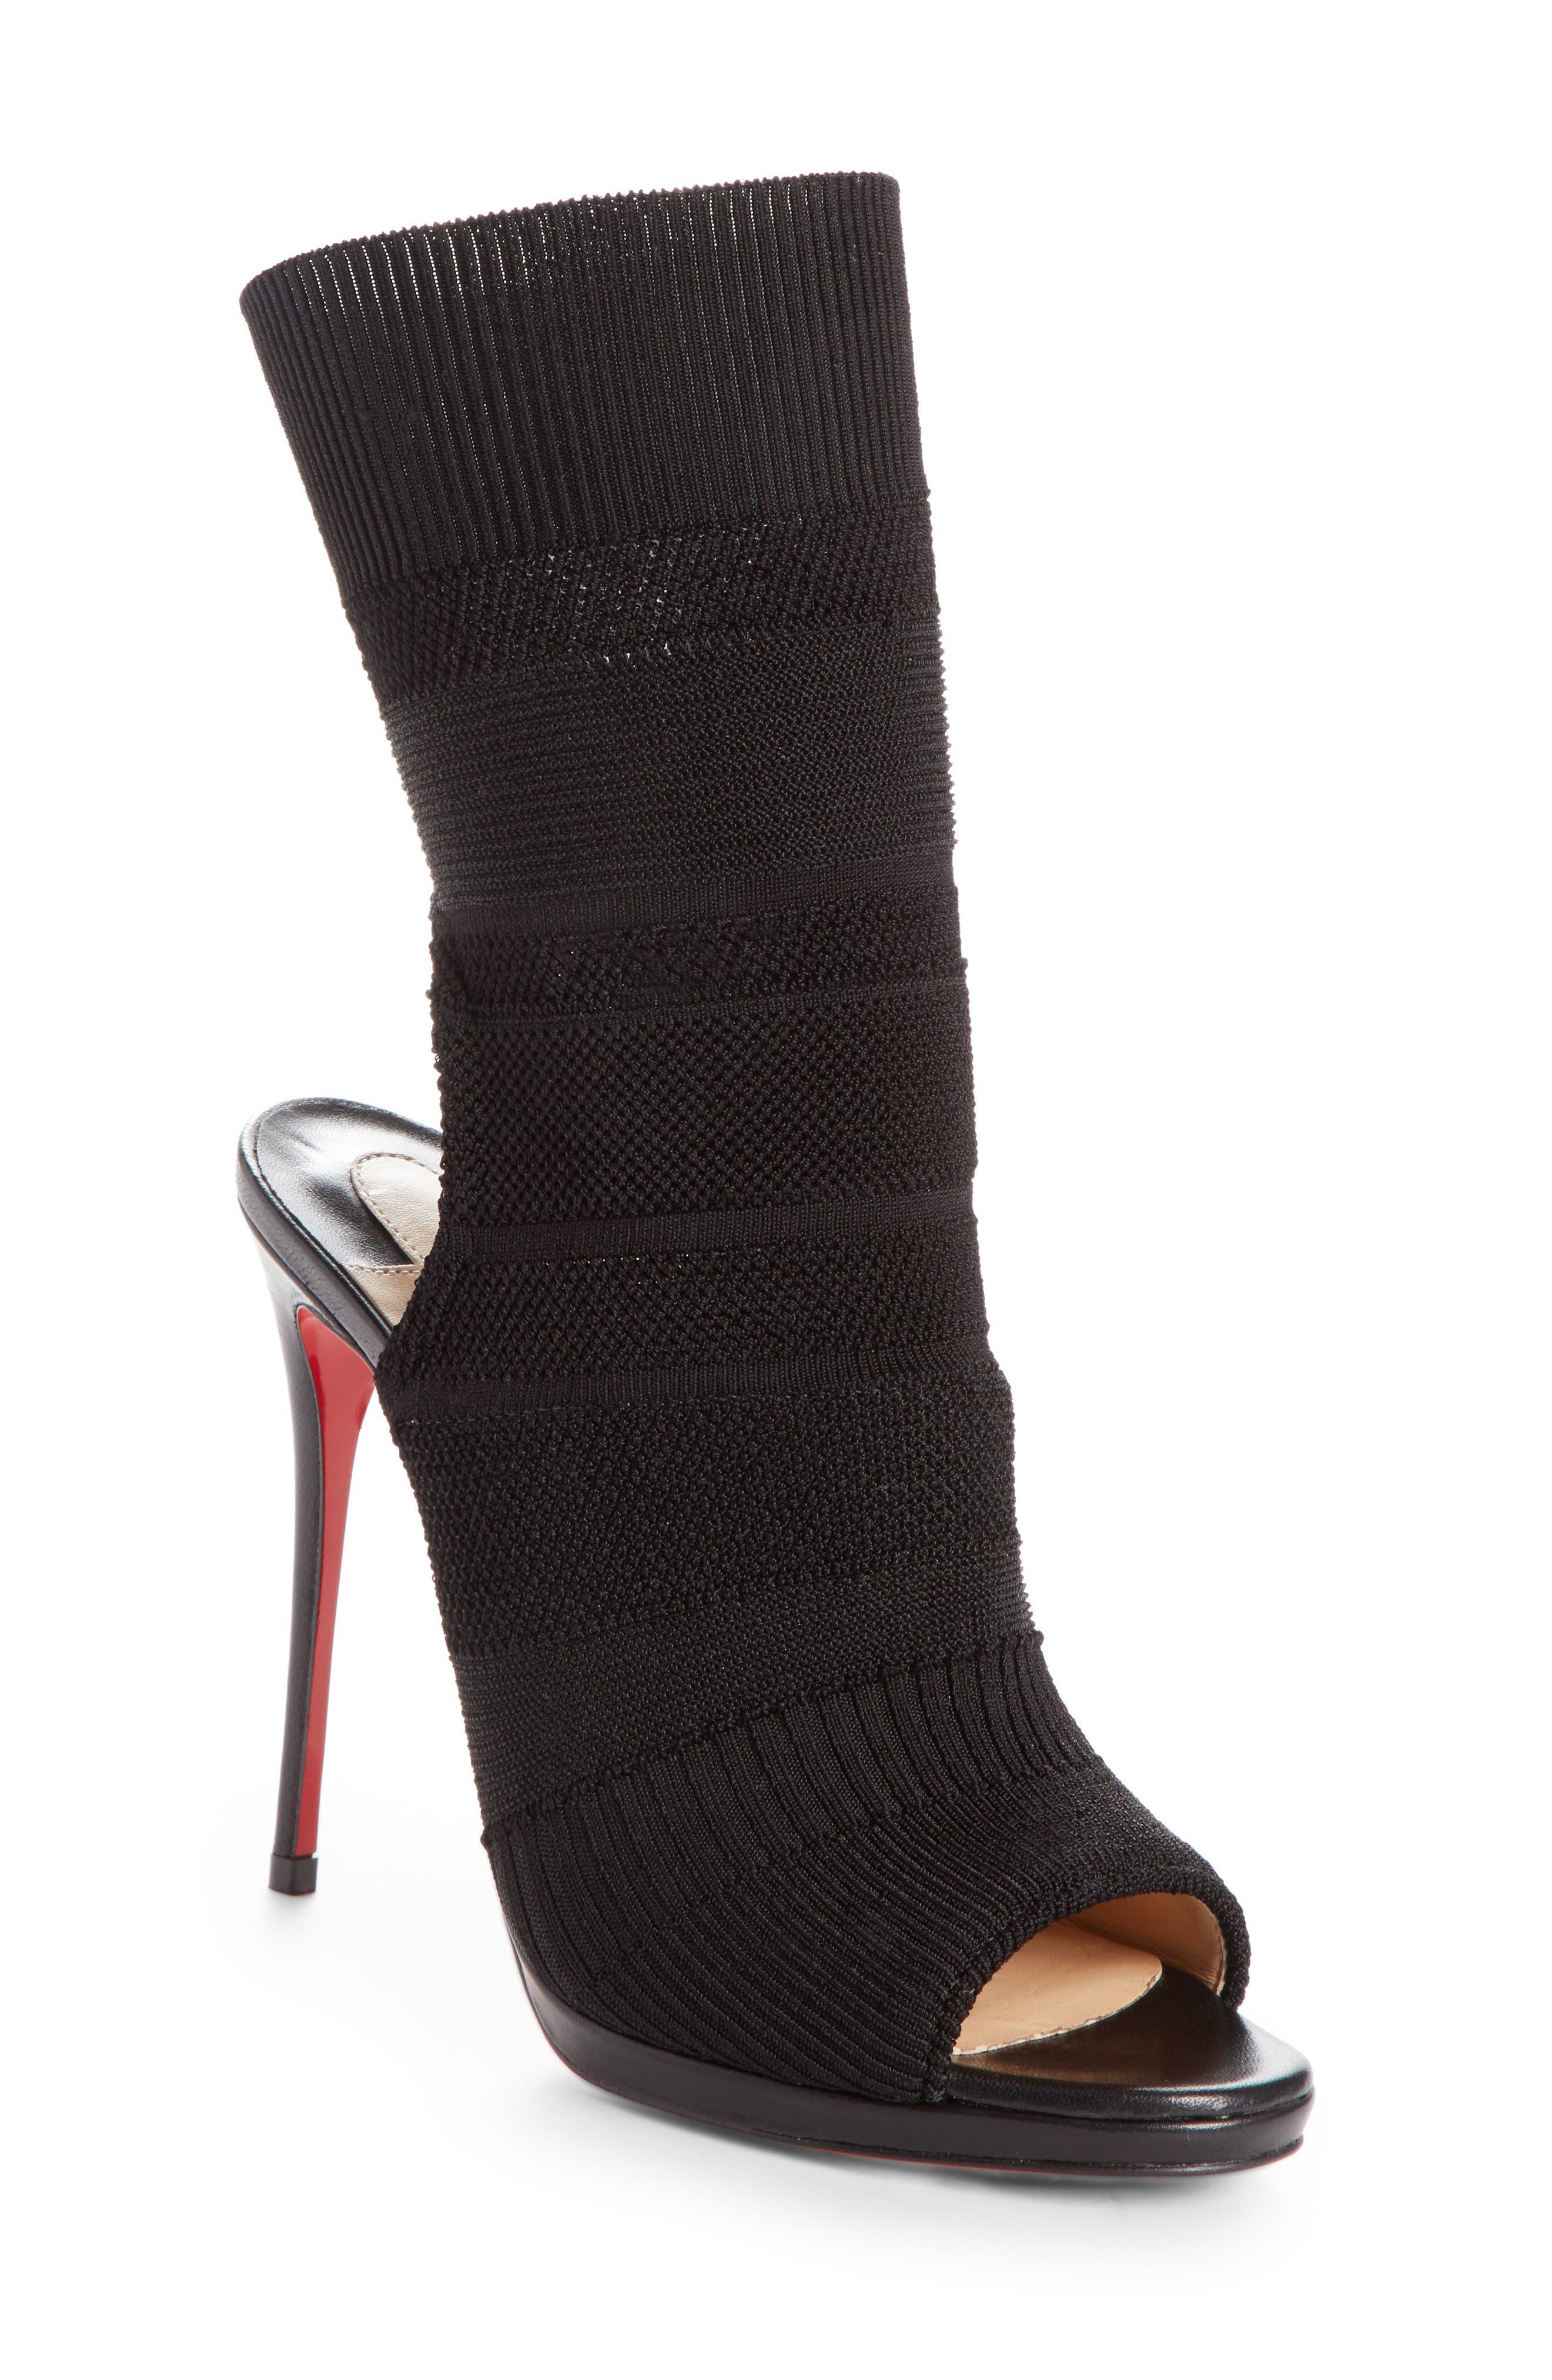 Cheminene Sock Sandal,                             Main thumbnail 1, color,                             001